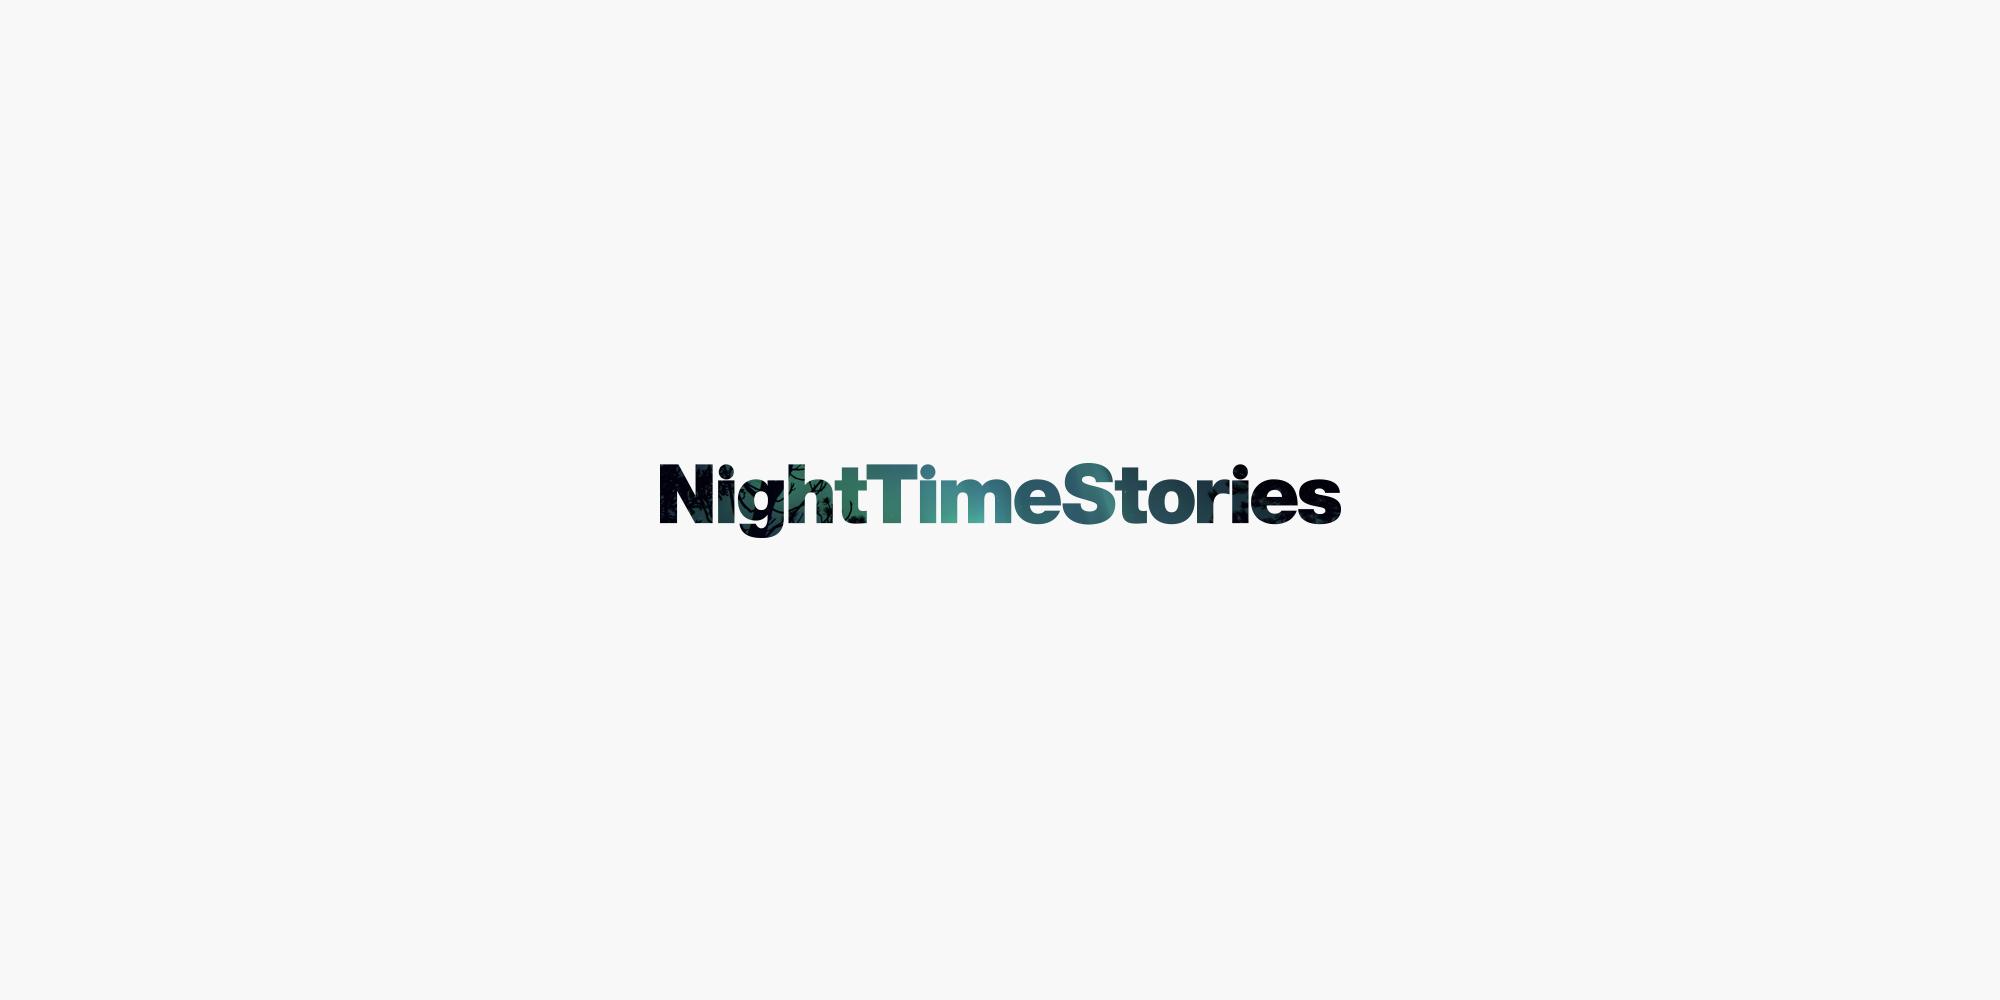 NightTimeStories.png